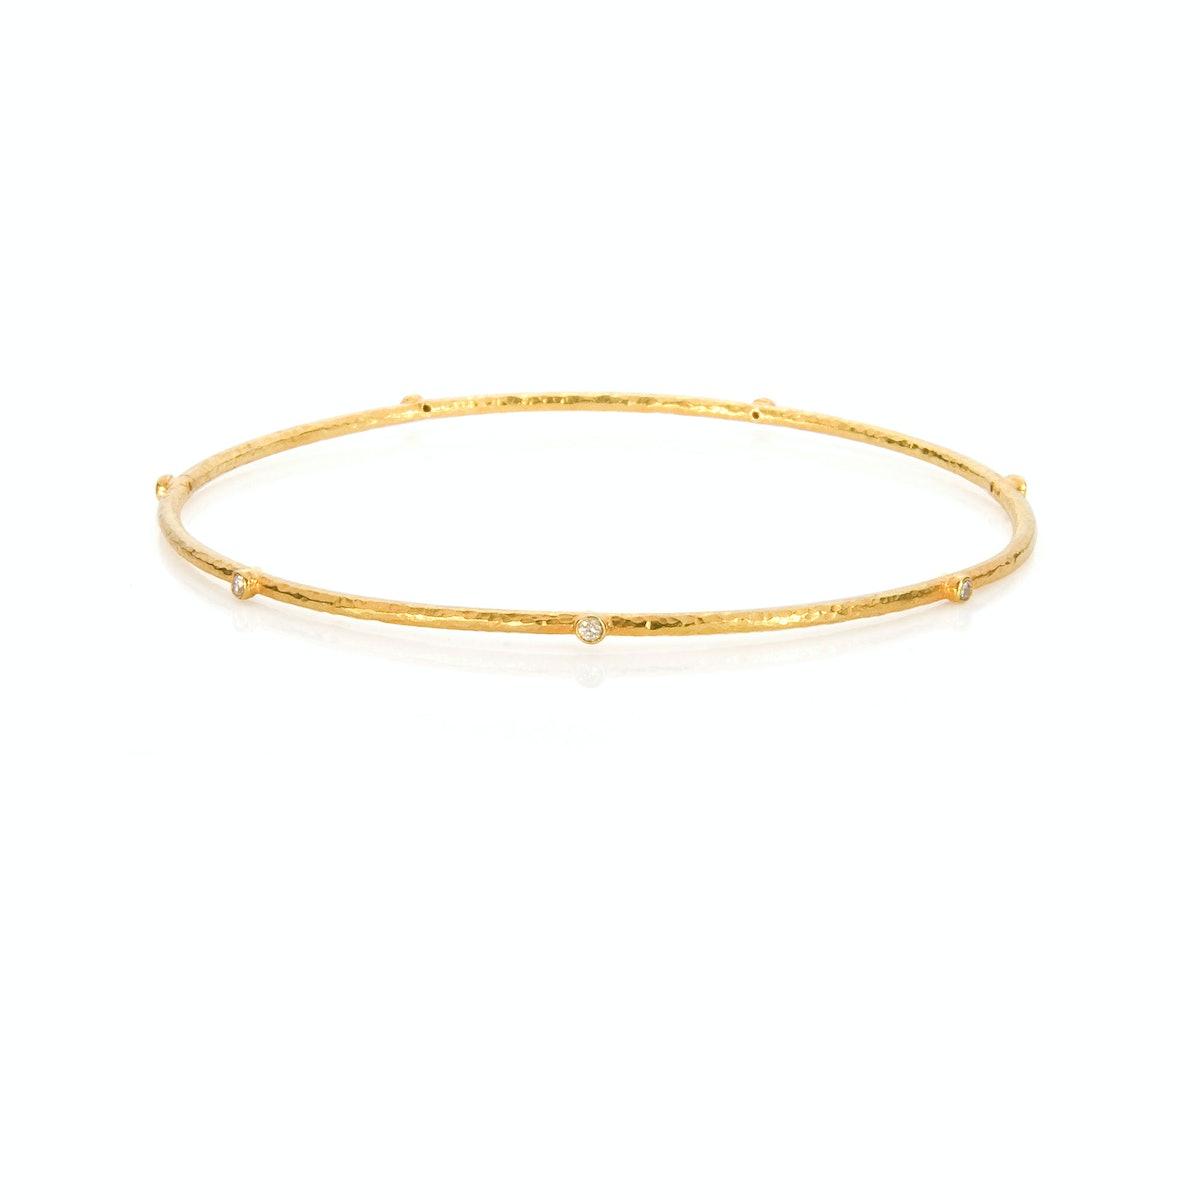 Satya gold bracelet